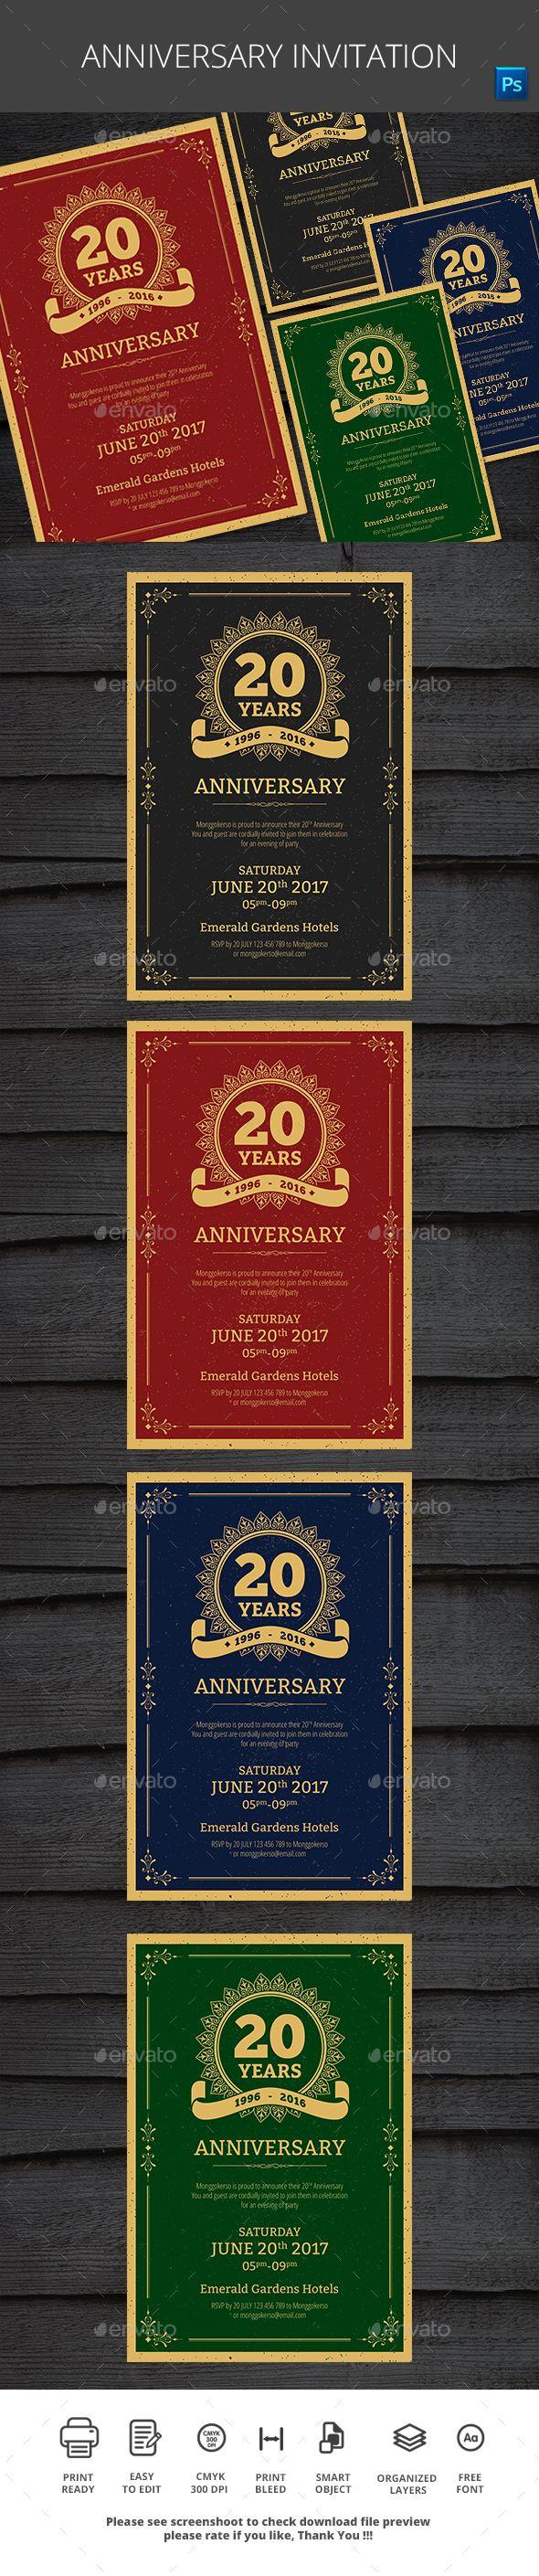 Anniversary Invitation Cards u0026 Invites Print